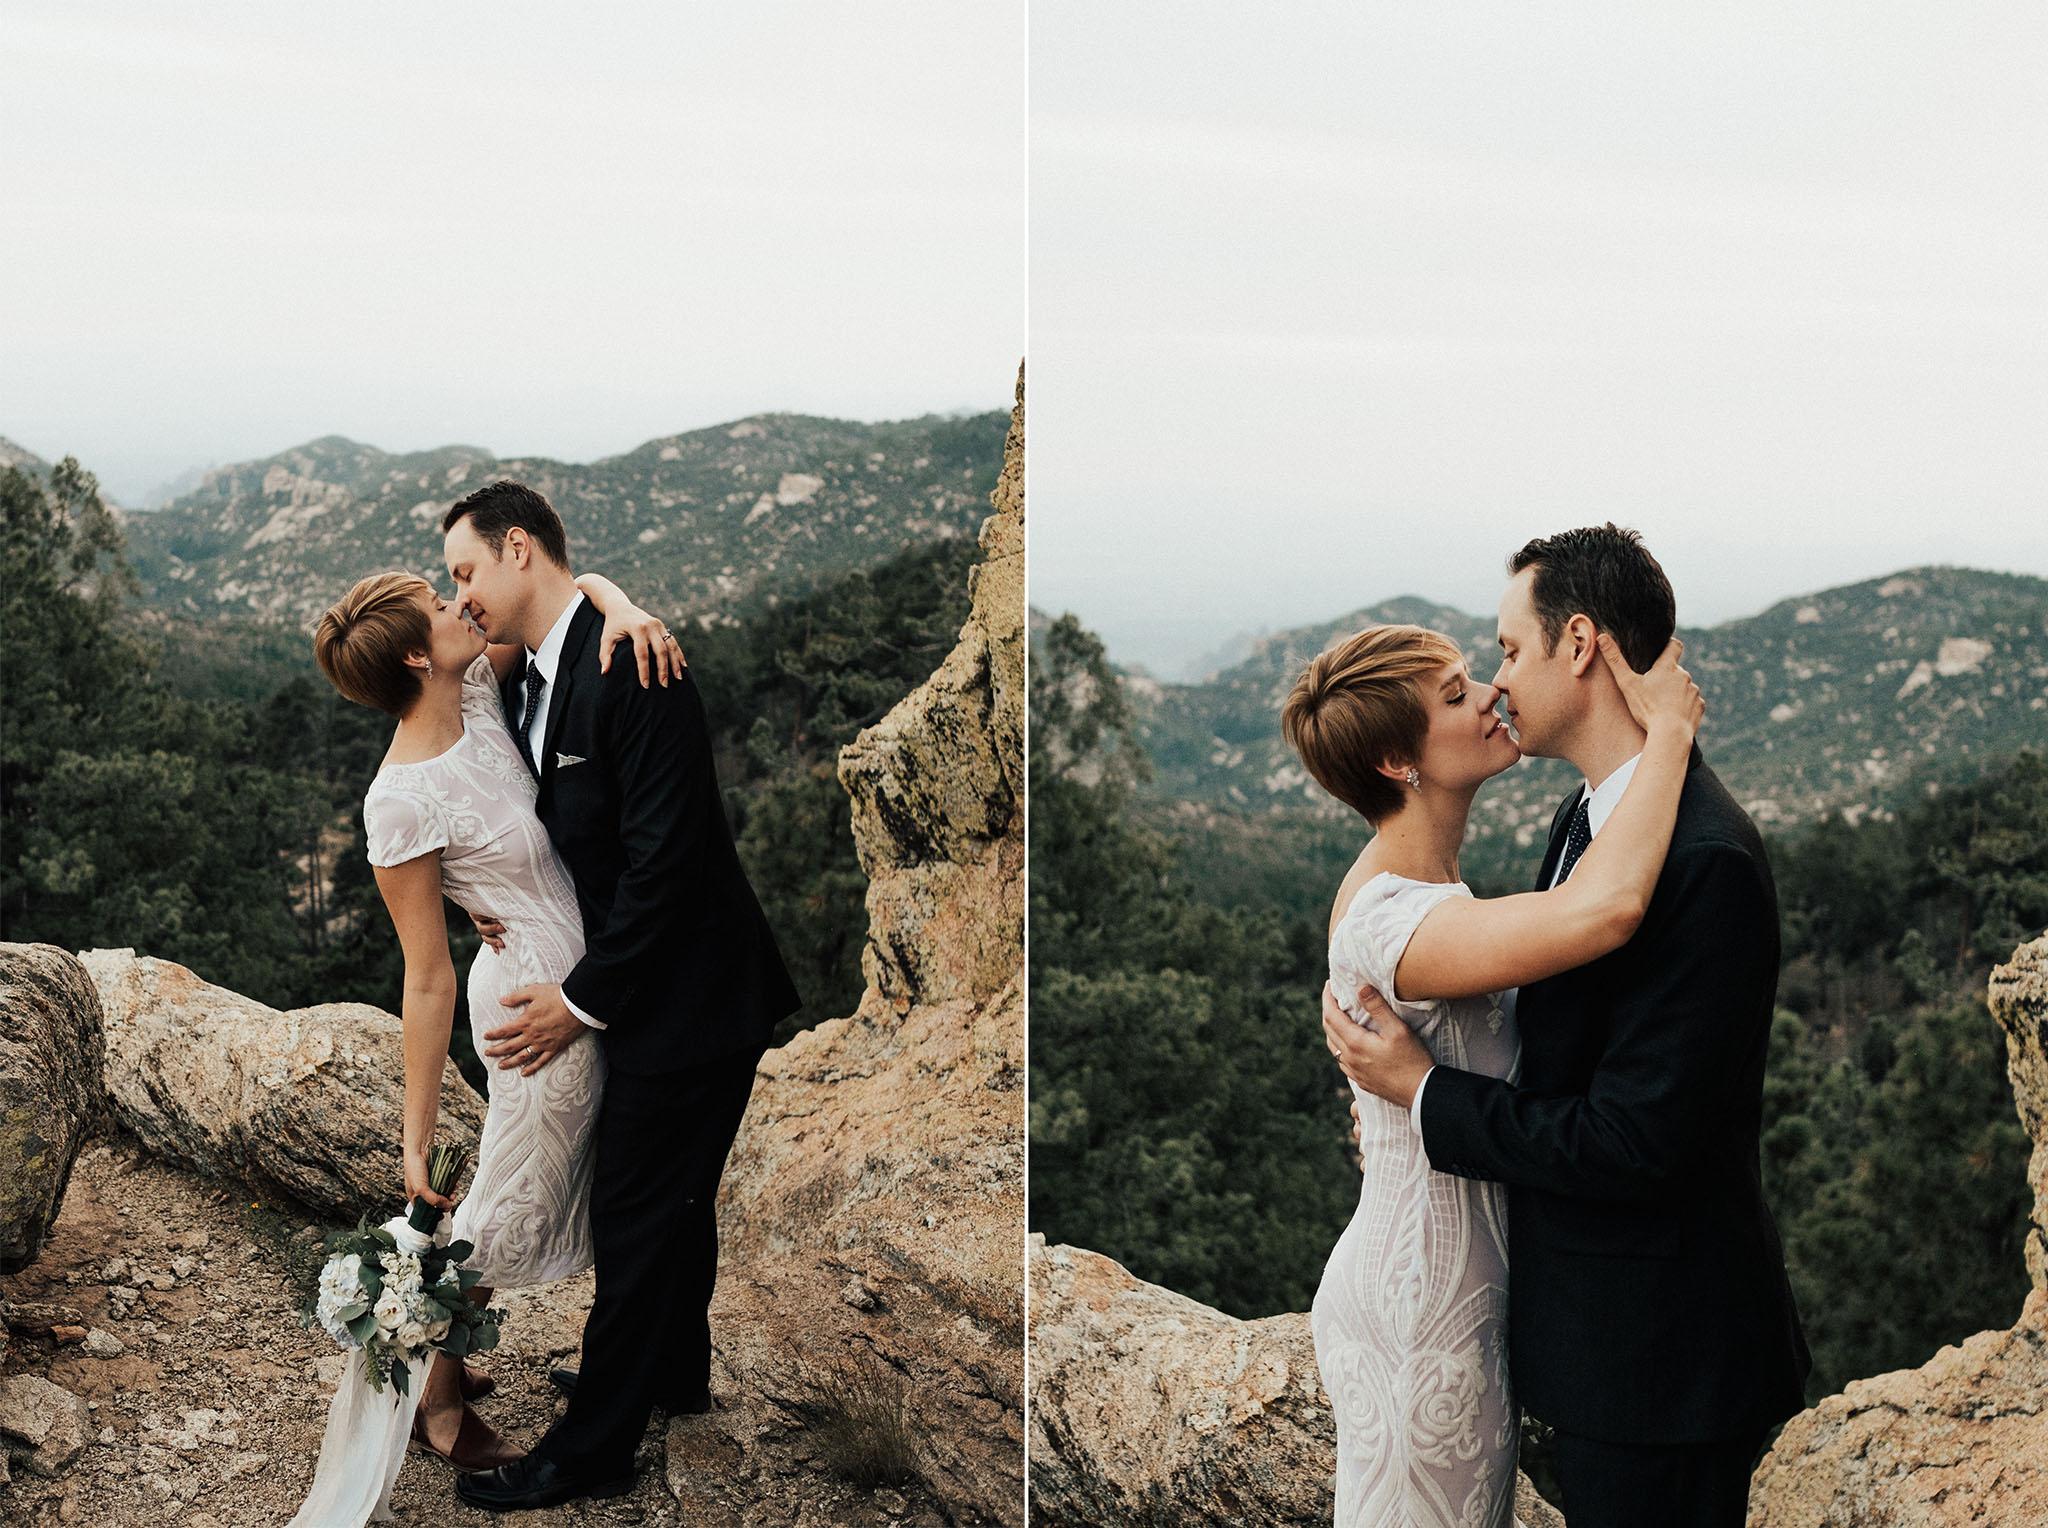 Arizona-Intimate-Elopement-Adventure-Photographer-Mount-Lemmon (39).jpg